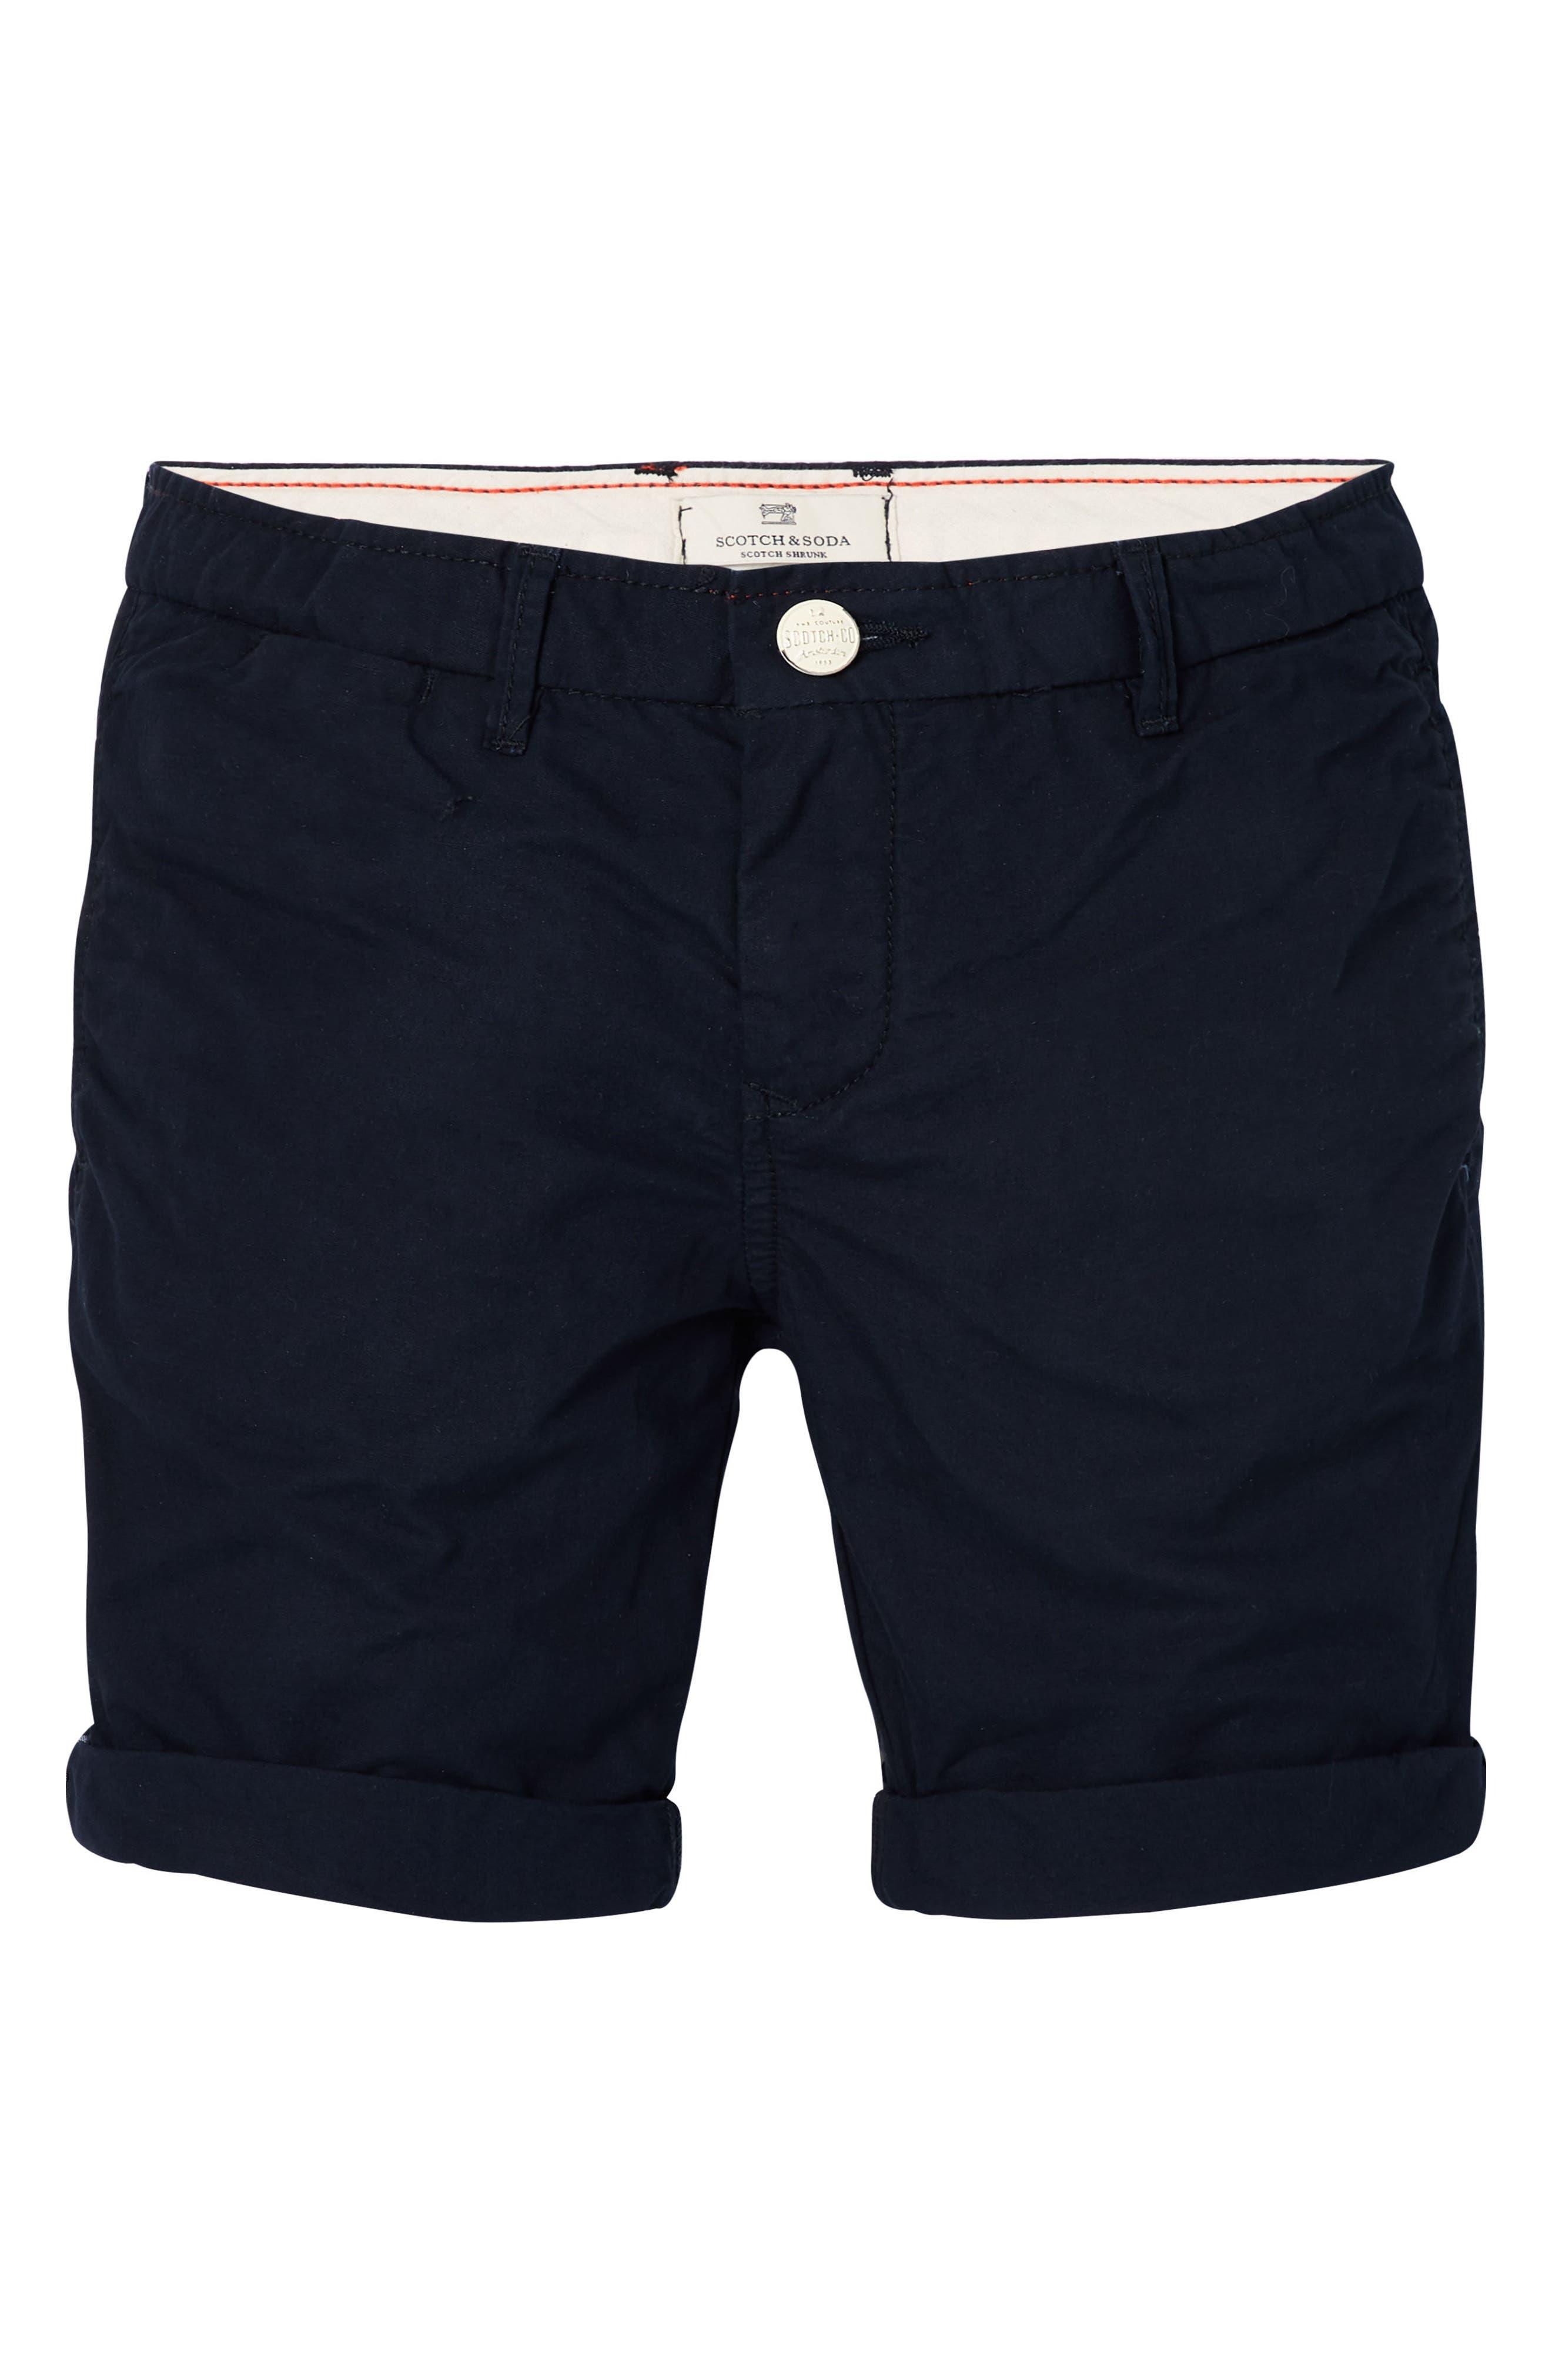 Poplin Shorts,                             Main thumbnail 1, color,                             Night